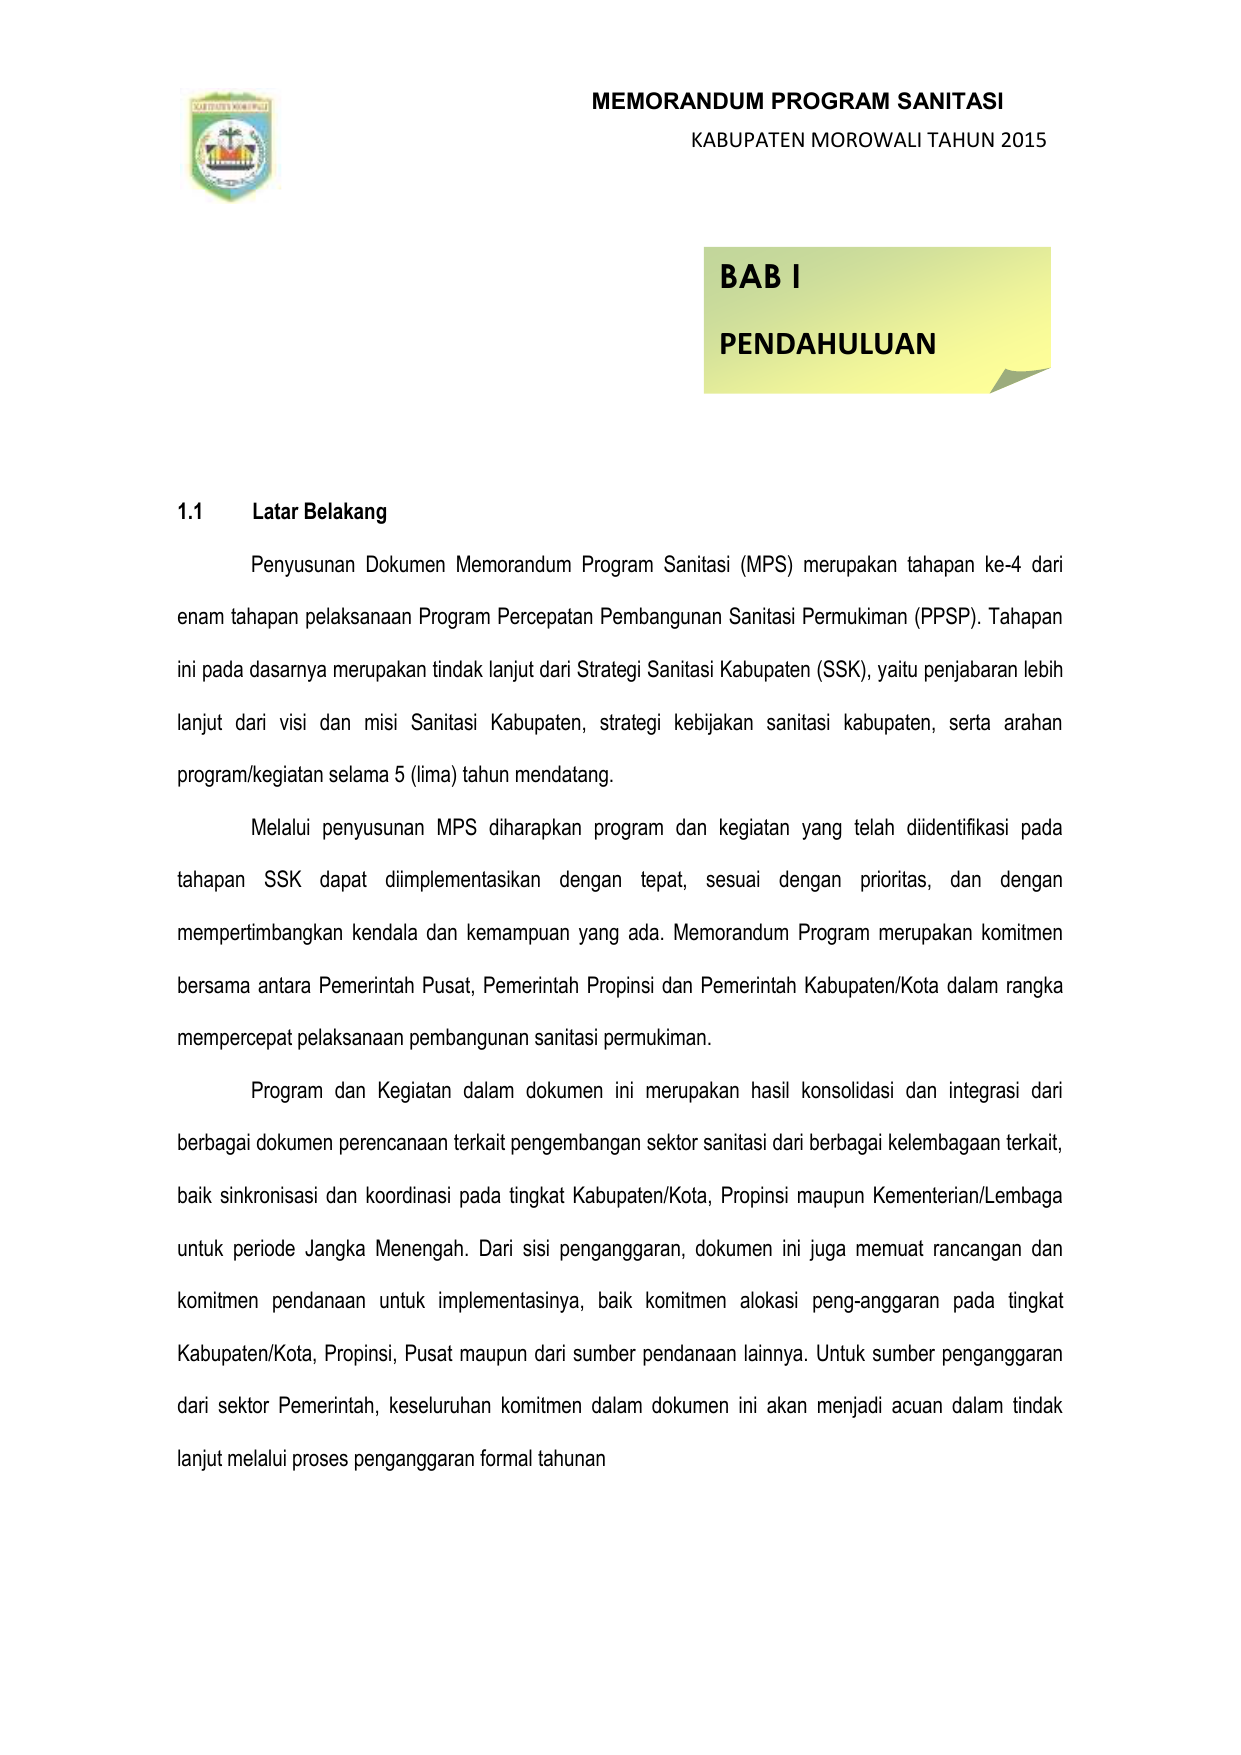 Rencana Struktur Ruang Wilayah Kabupaten Morowali